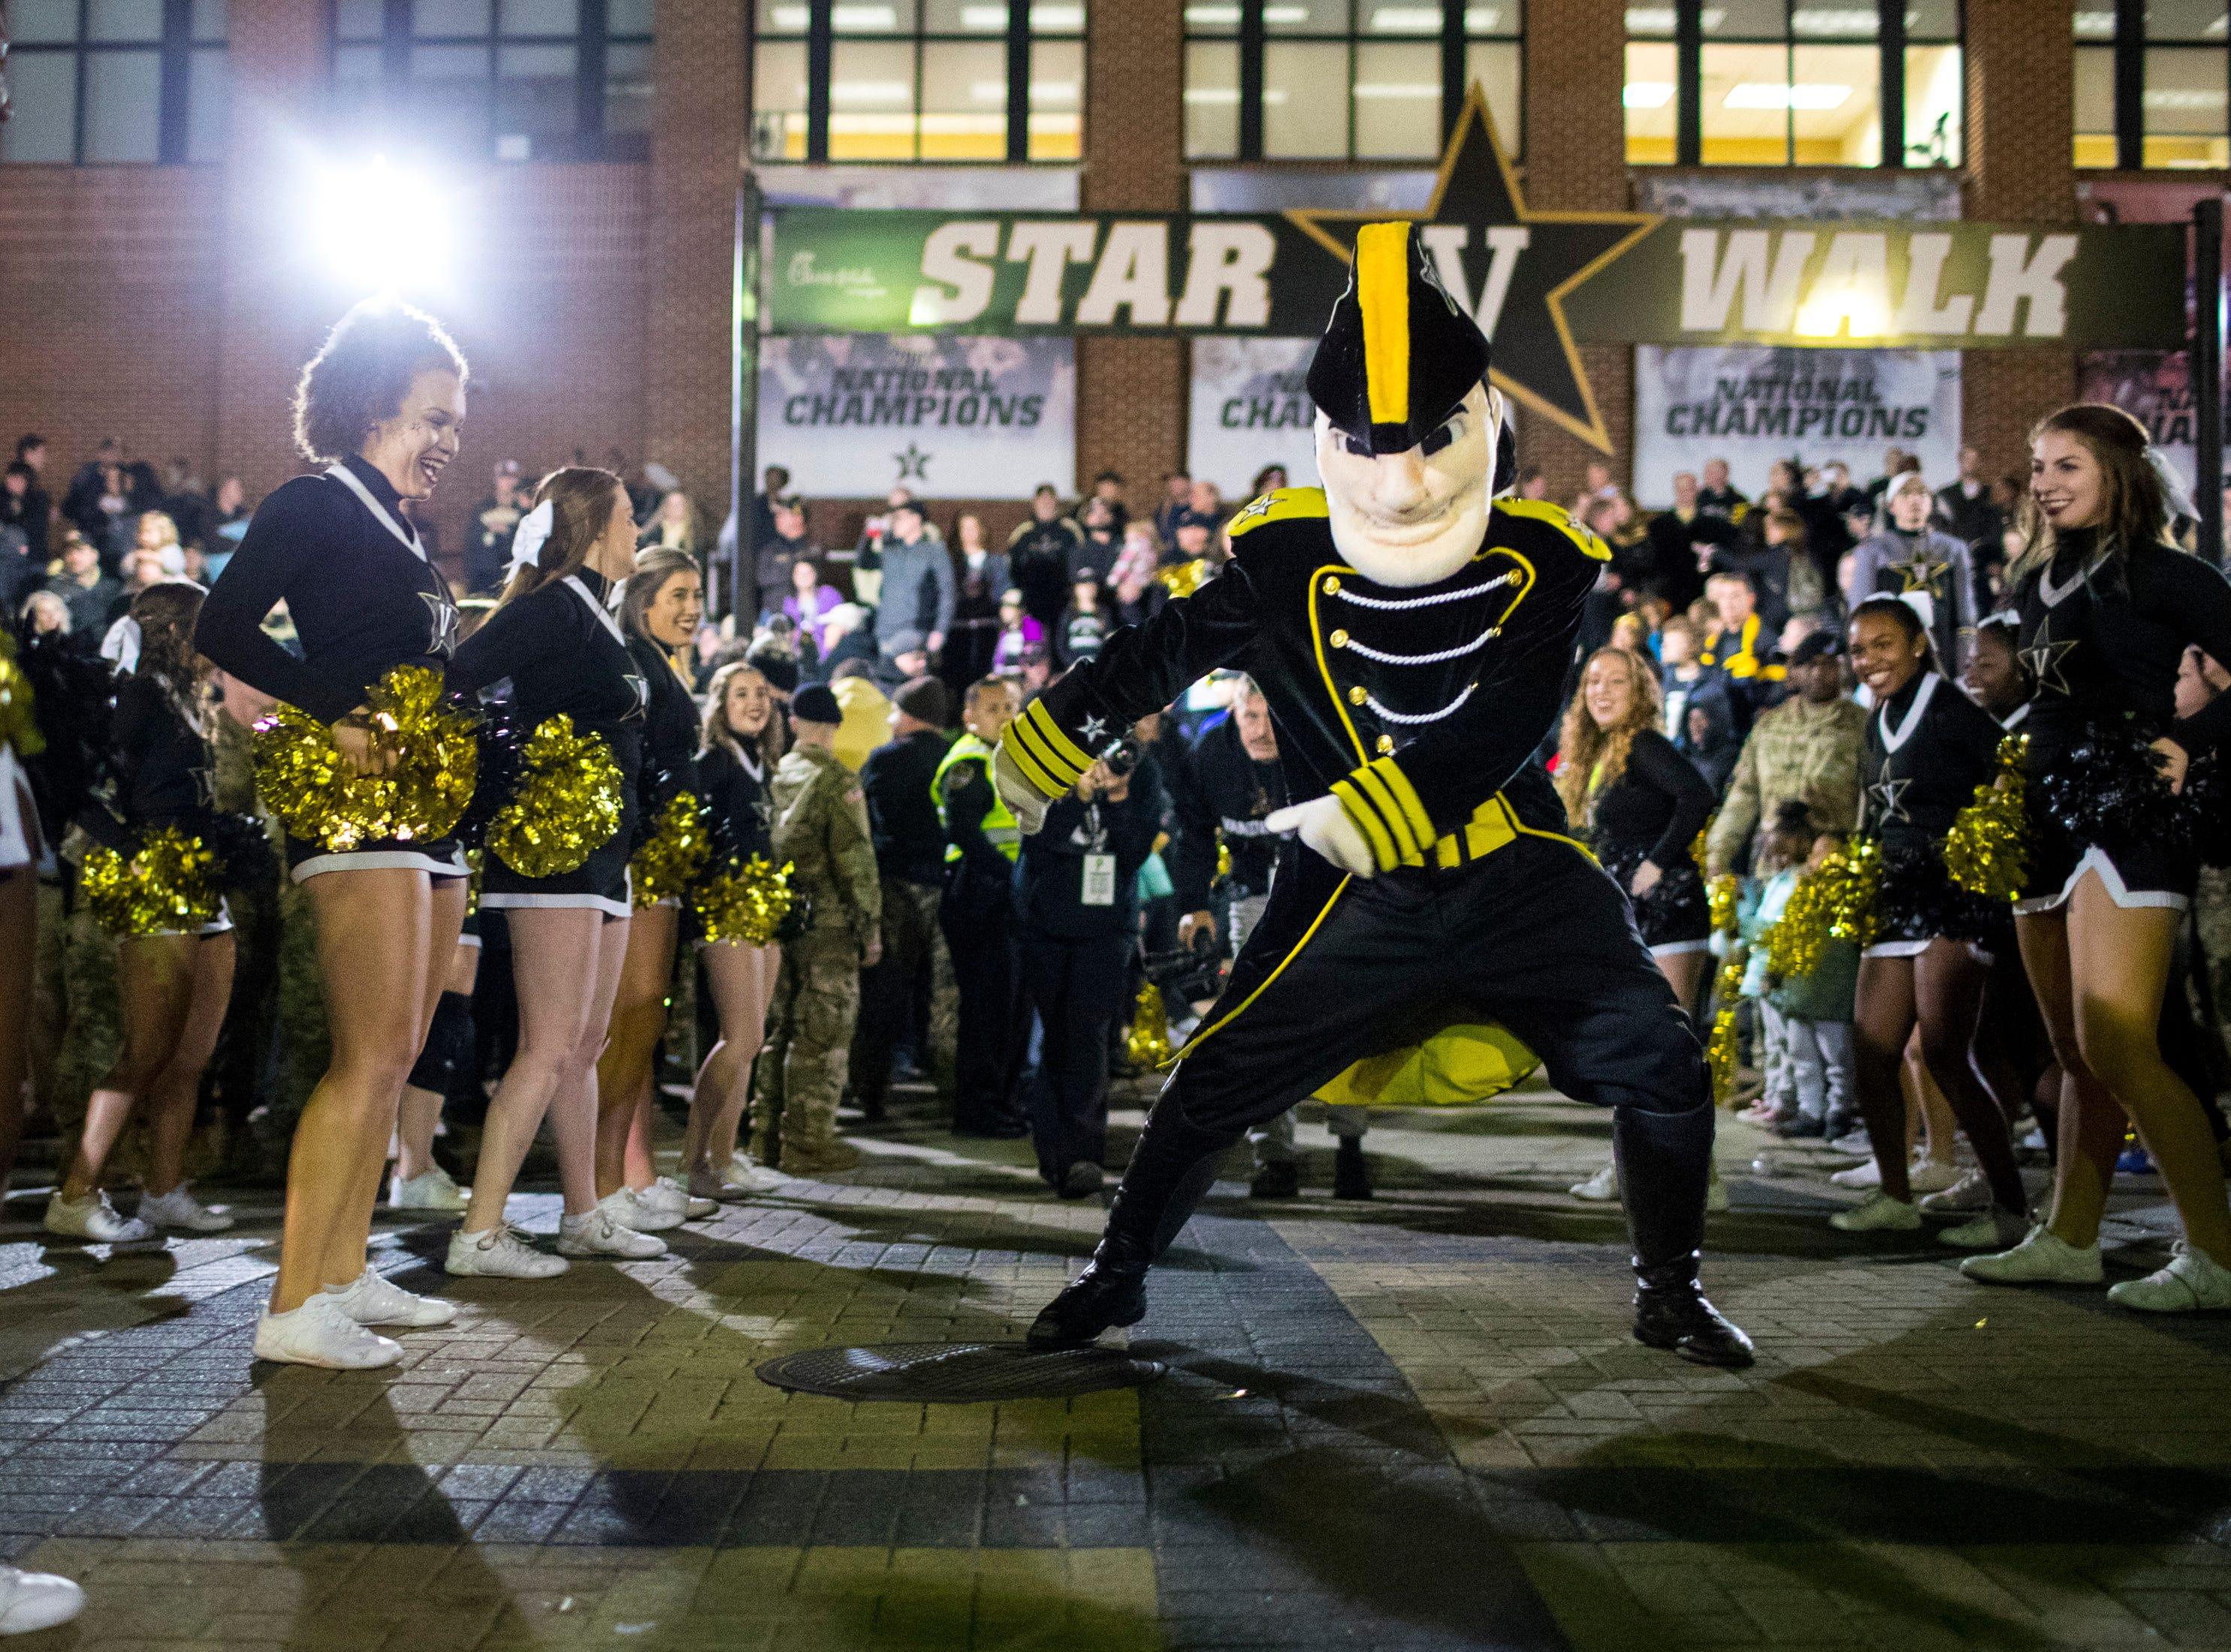 Mr. Commodore does the floss dance during the star walk before Vanderbilt's game against Ole Miss, outside of Vanderbilt Stadium in Nashville on Saturday, Nov. 17, 2018.